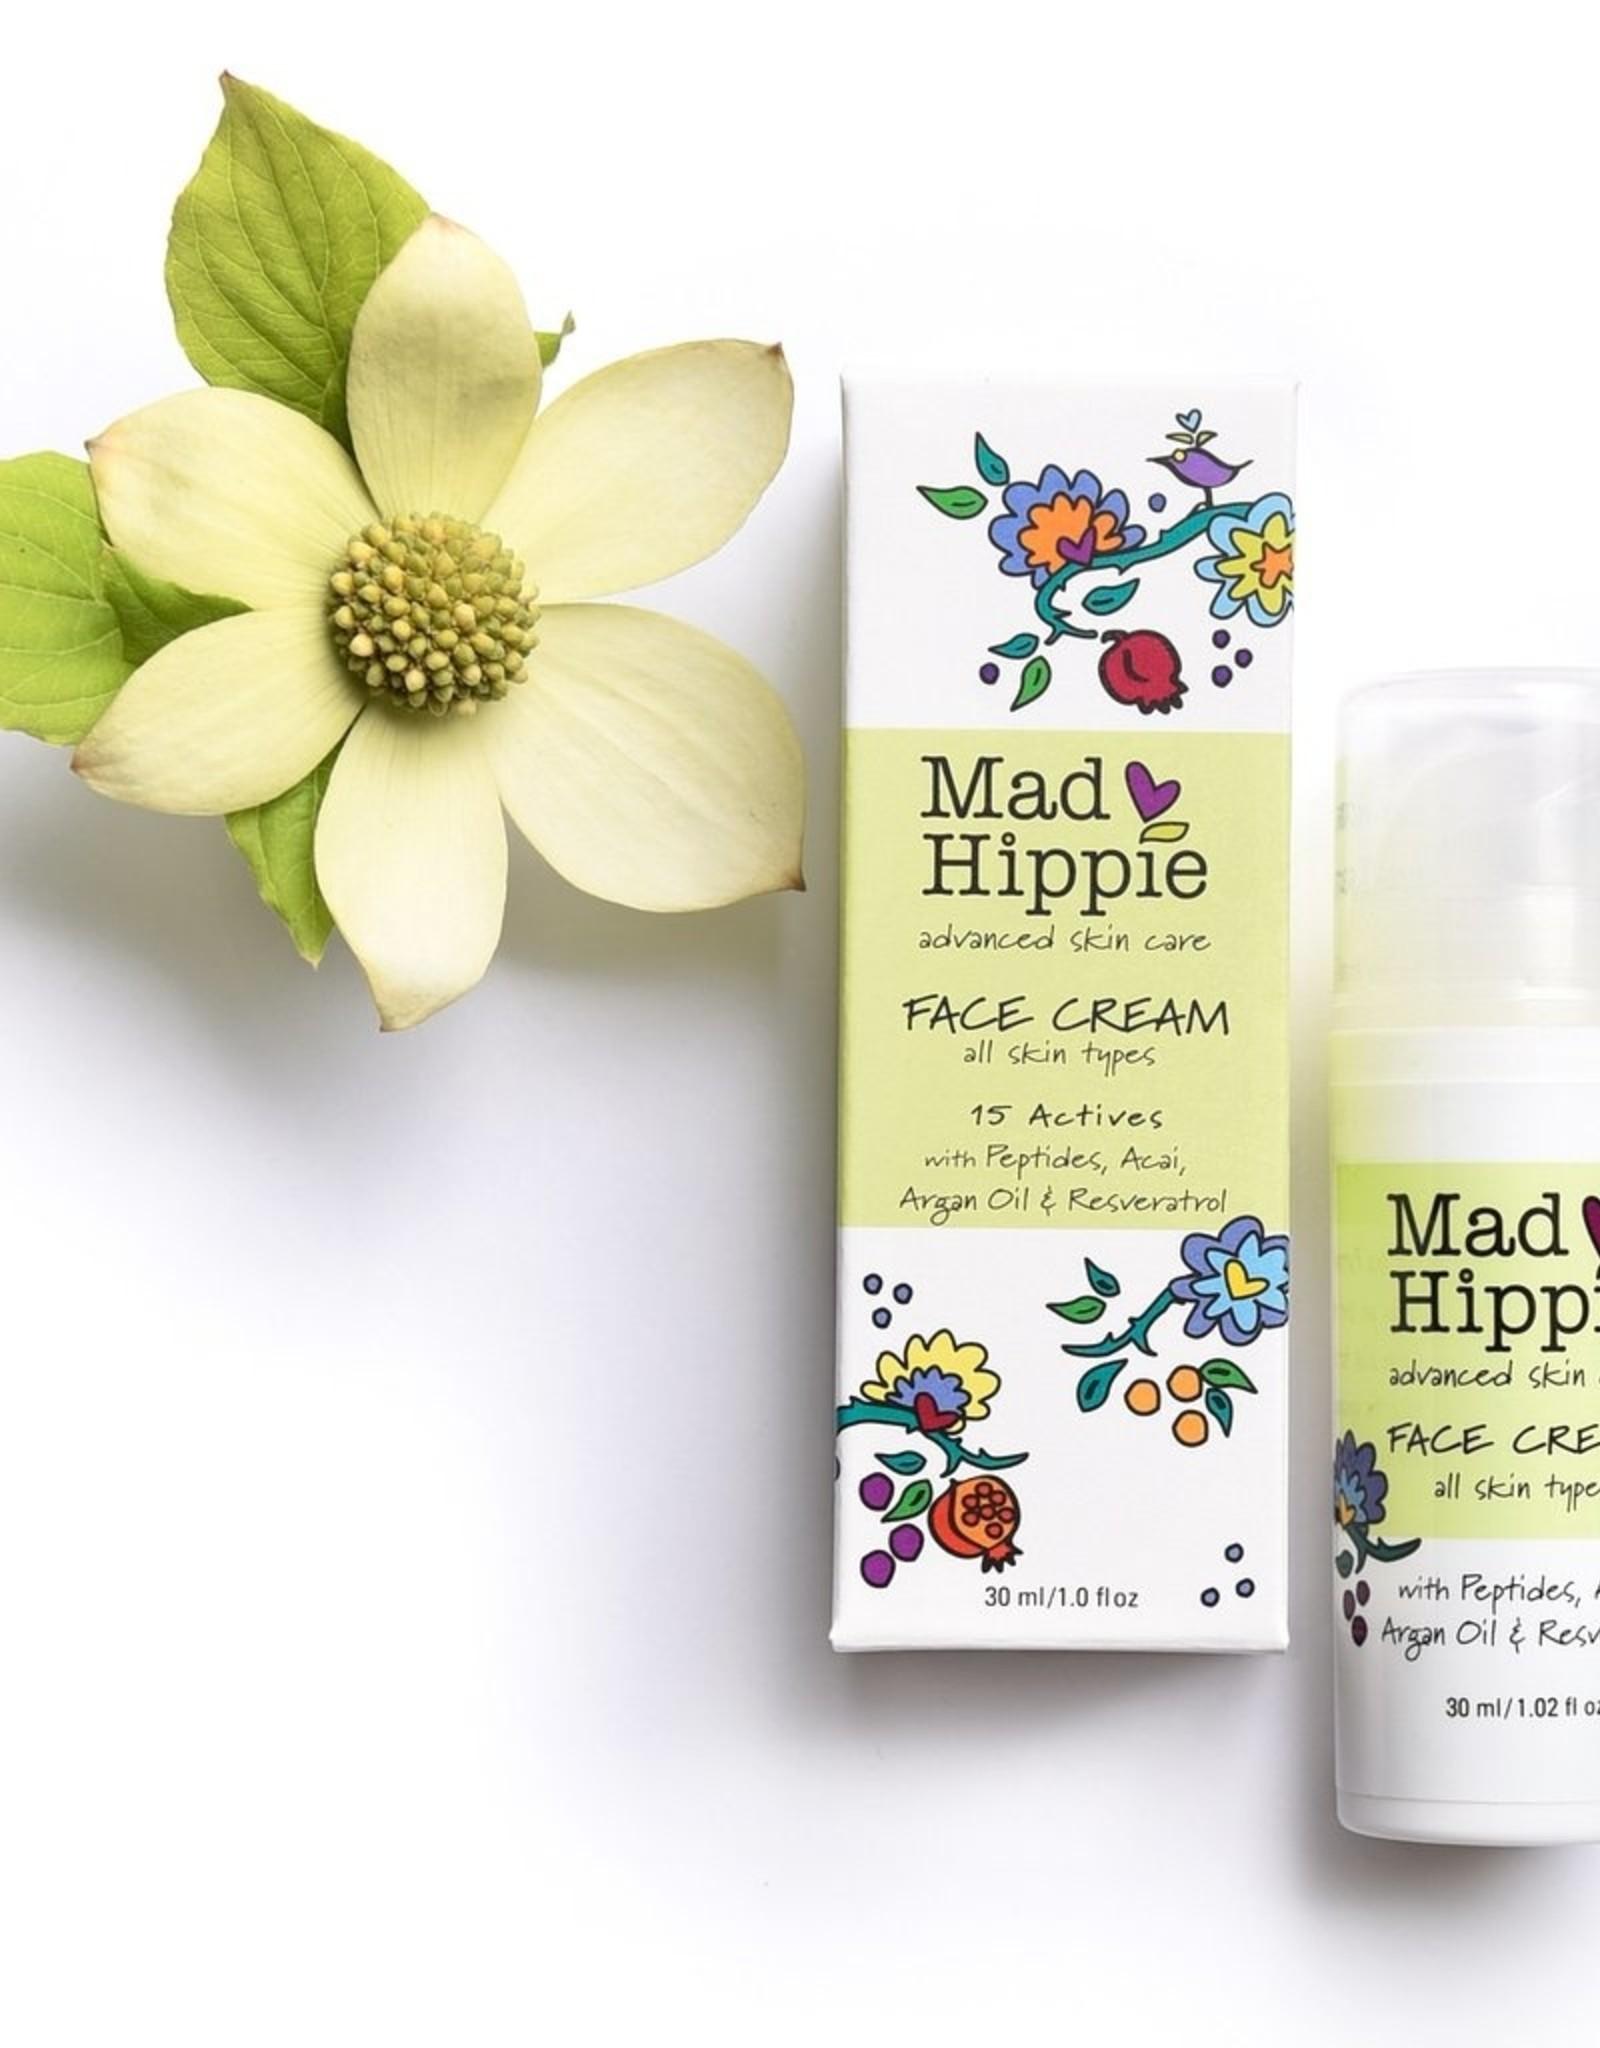 Mad Hippie Face Cream 30ml